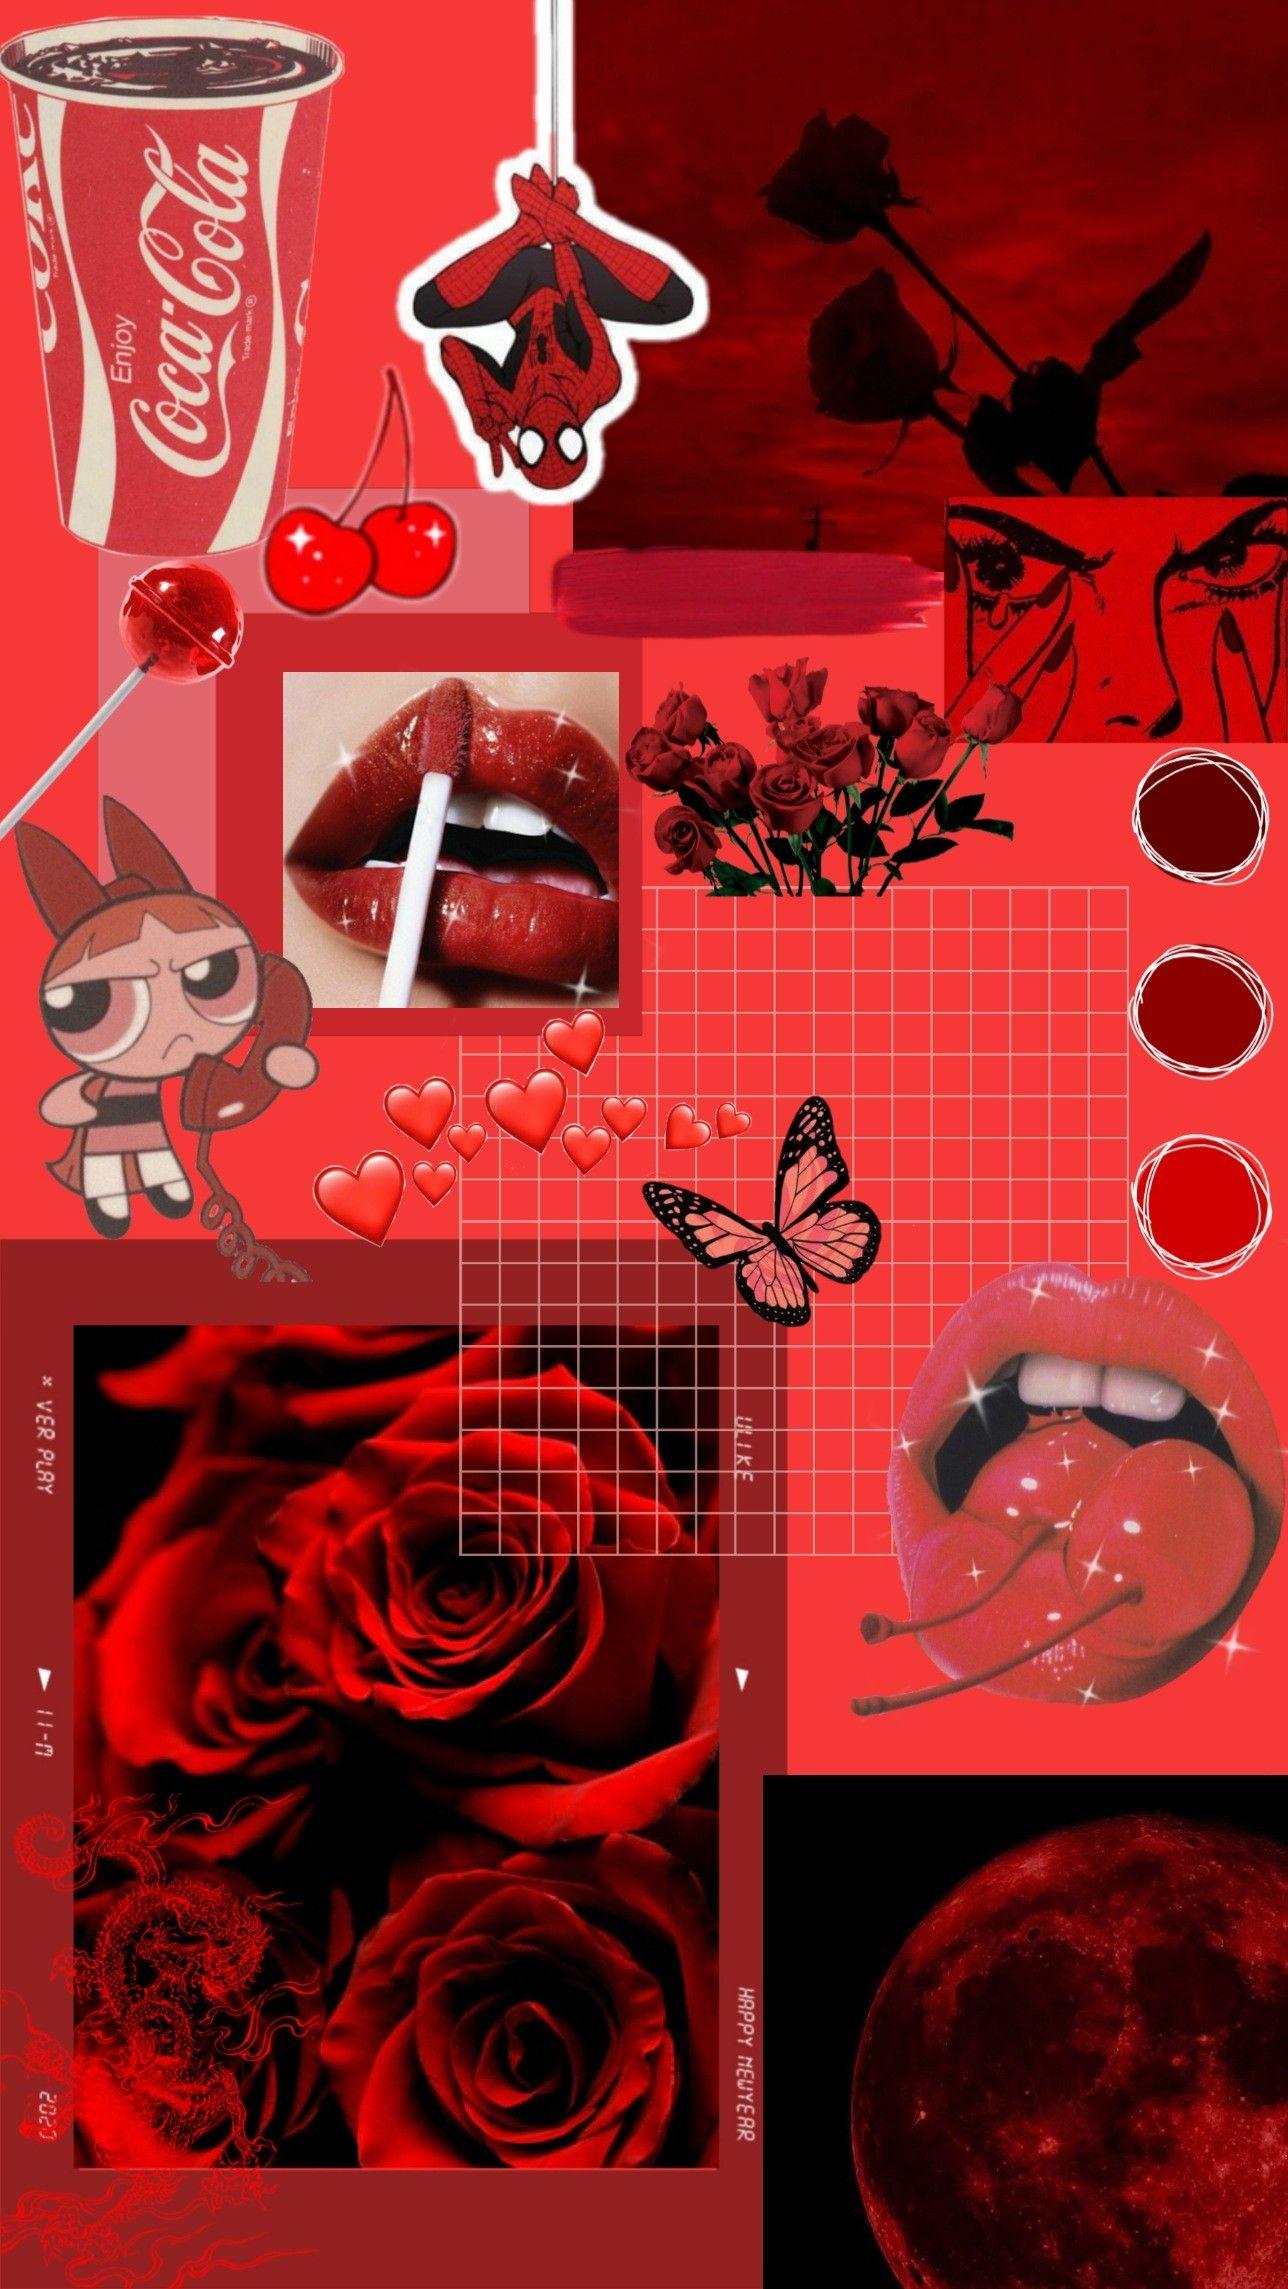 Red Aesthetic Wallpaper Peach Wallpaper Iphone Wallpaper Tumblr Aesthetic Powerpuff Girls Wallpaper